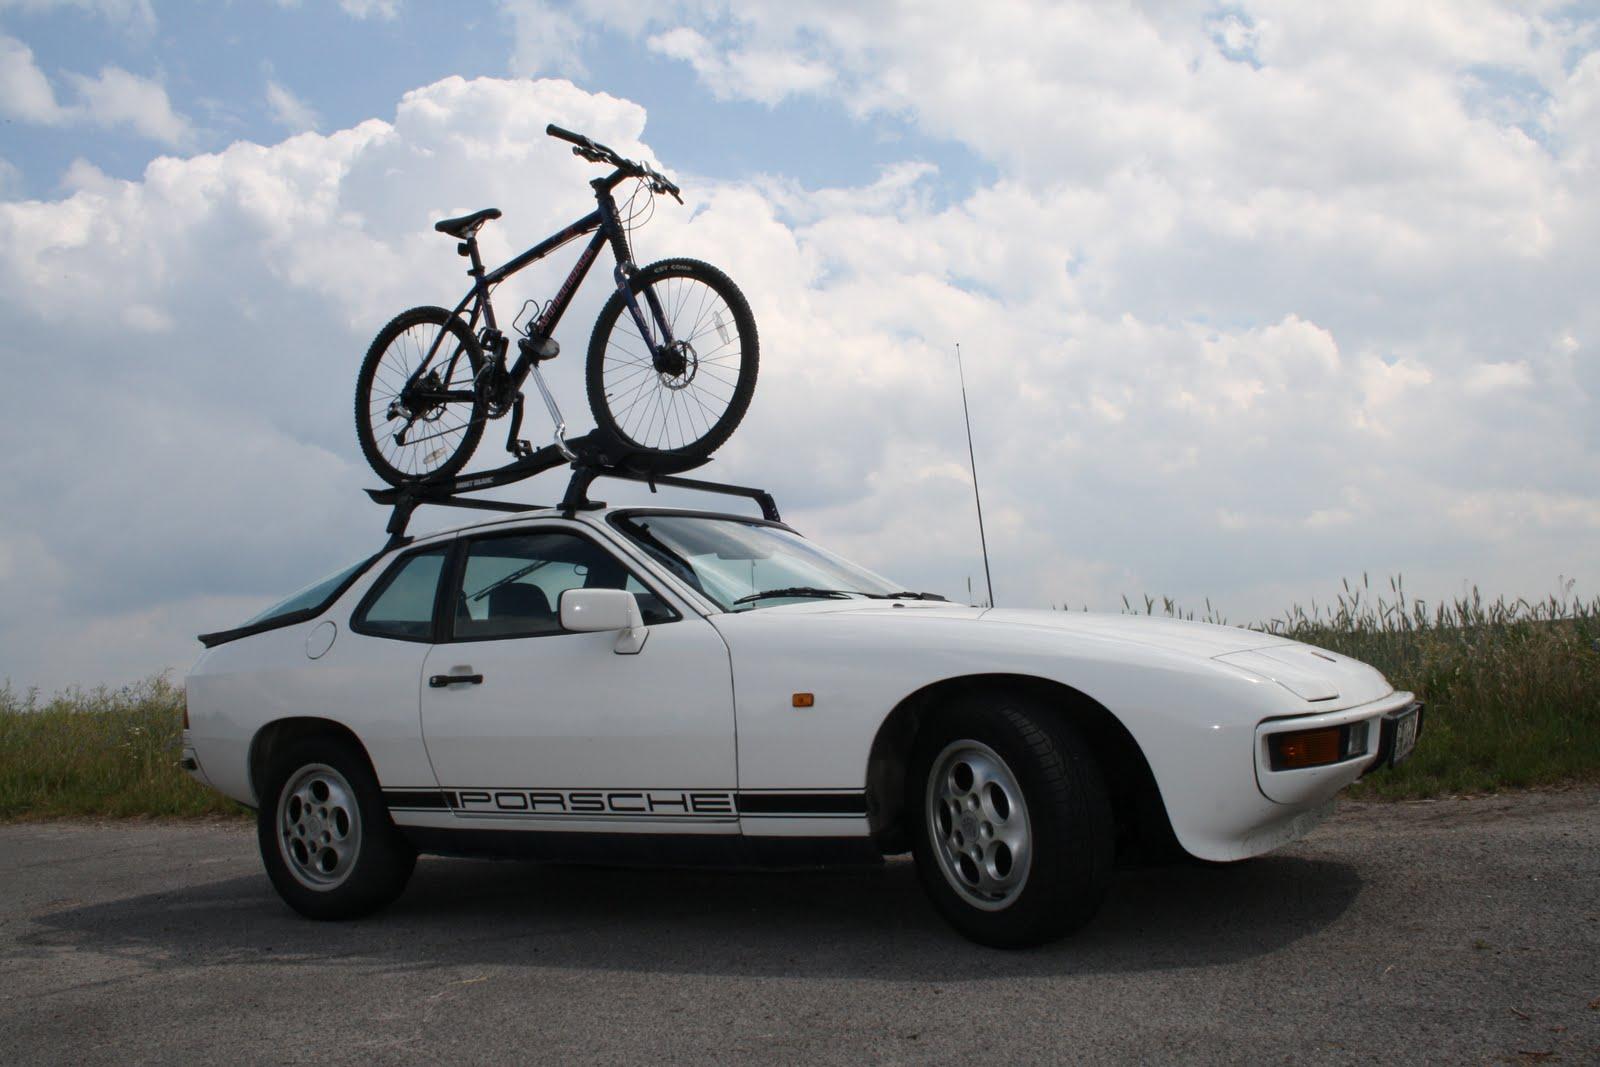 Porsche 924: Funfactor upgrade